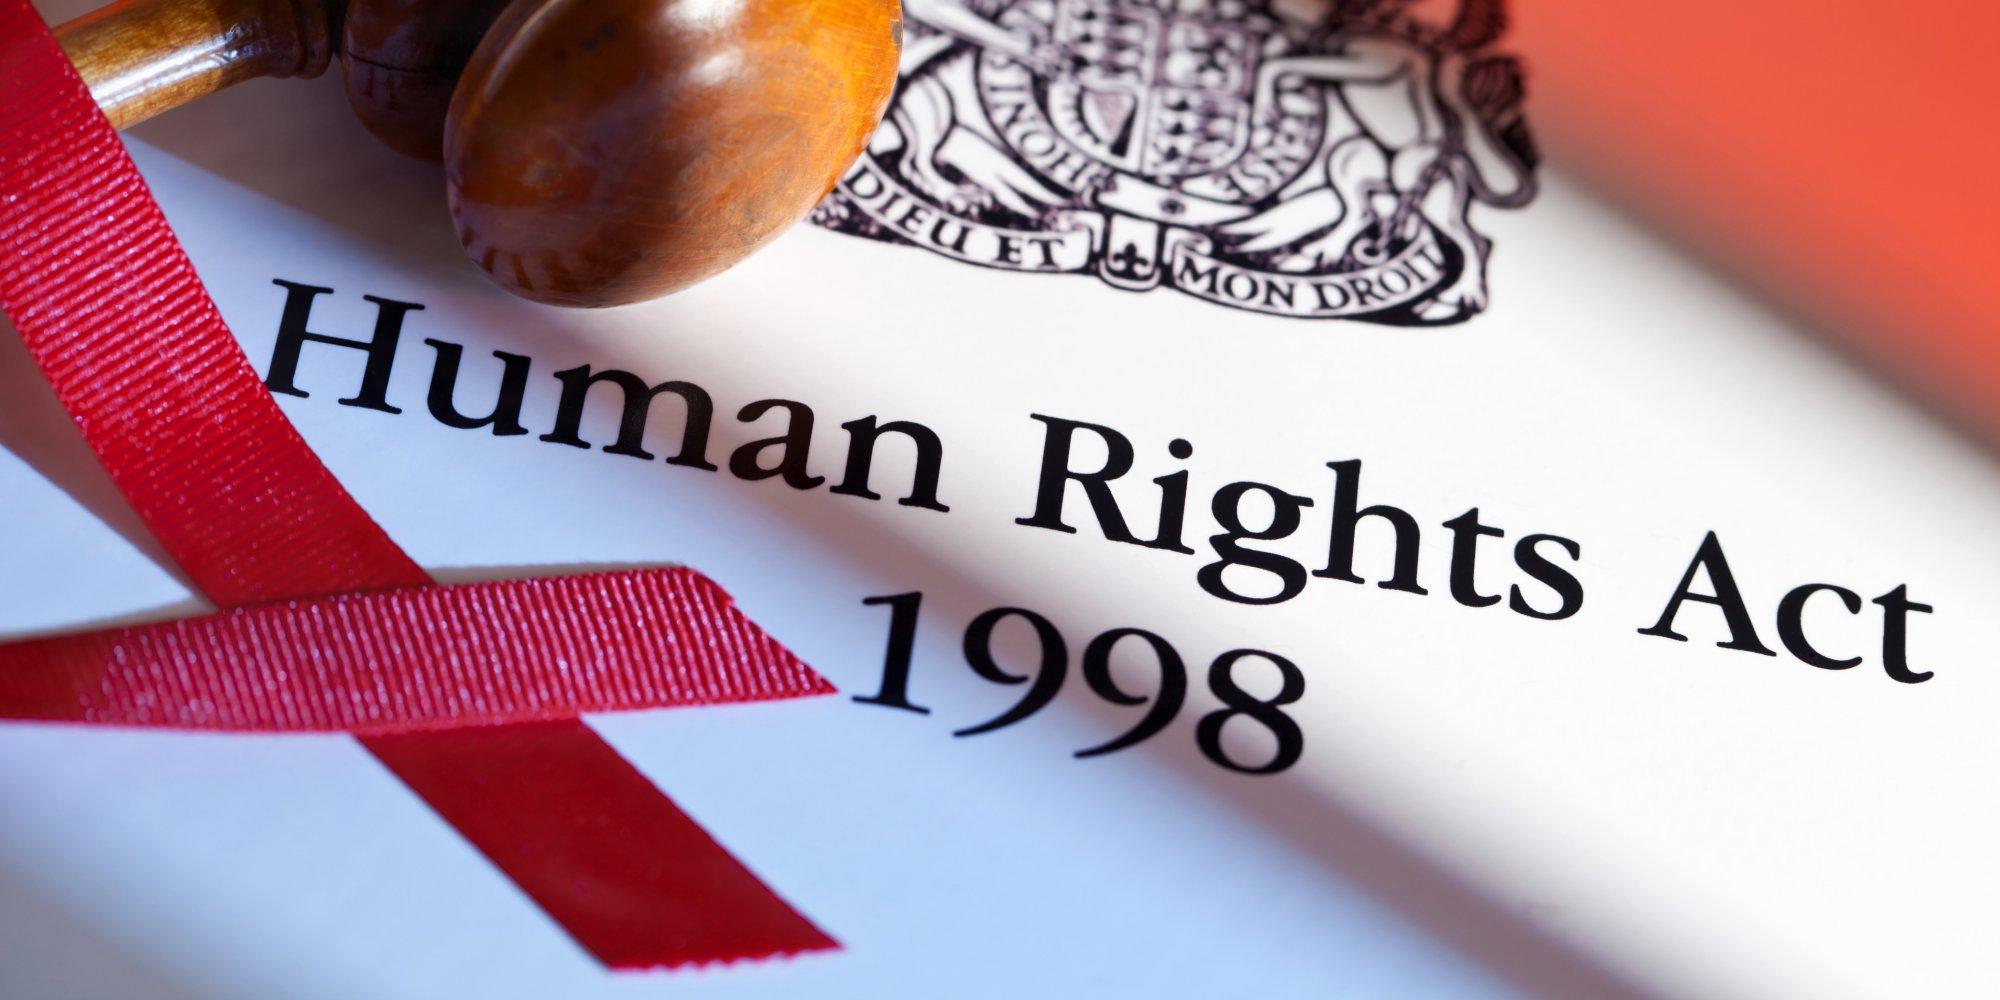 humanrightsact.jpg